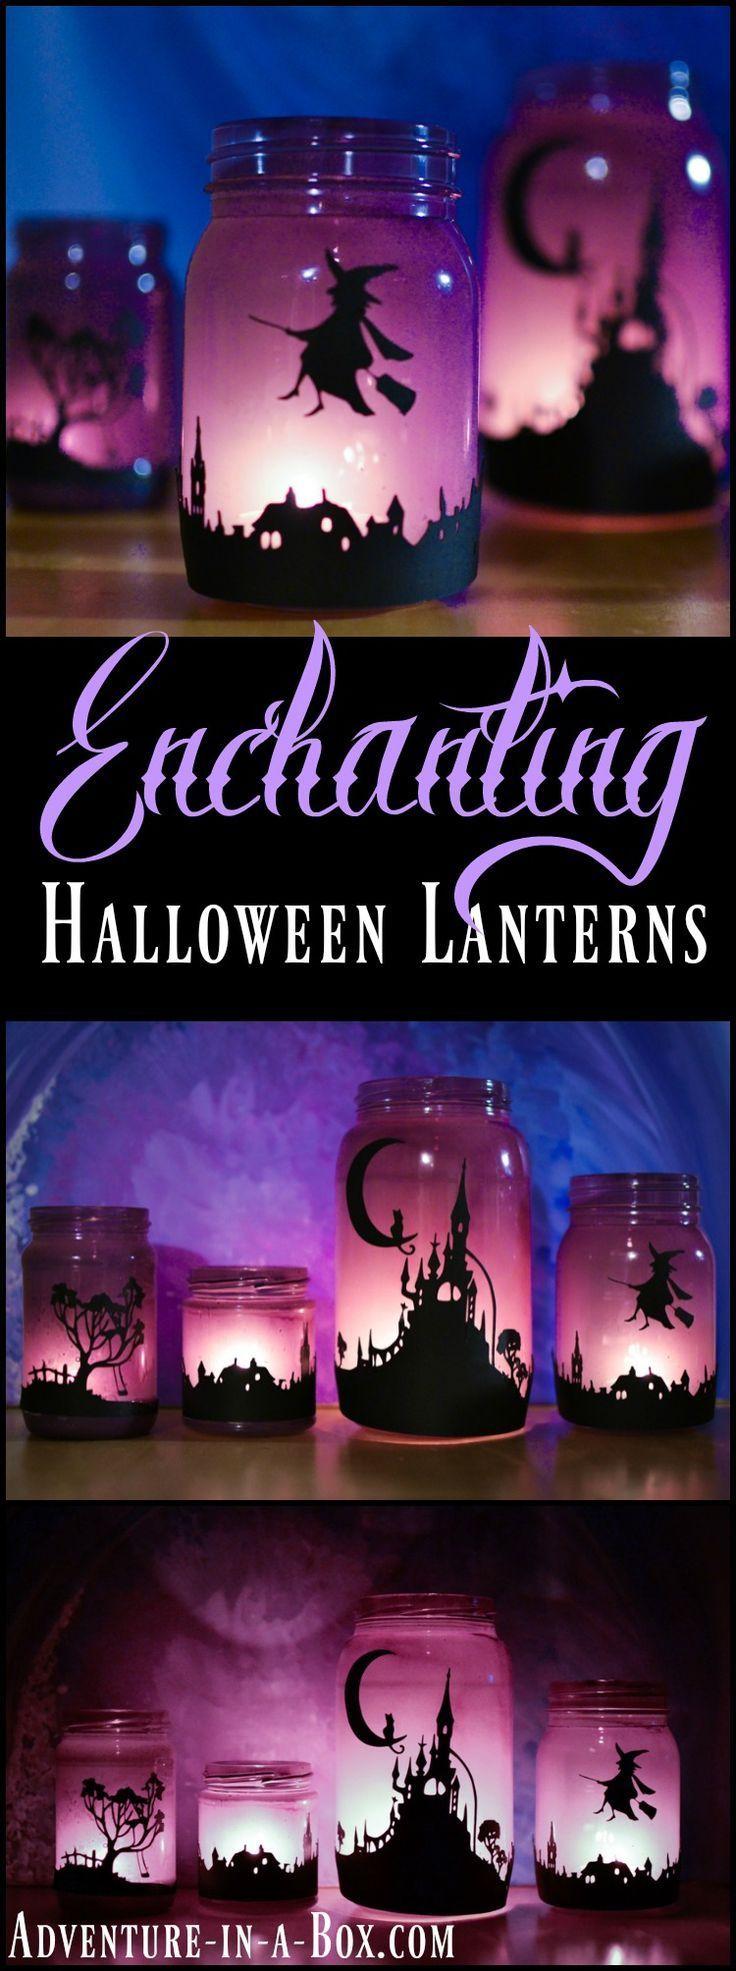 Make a set of enchanting Halloween lanterns from mason jars, suitable for elegant Halloween party decor.